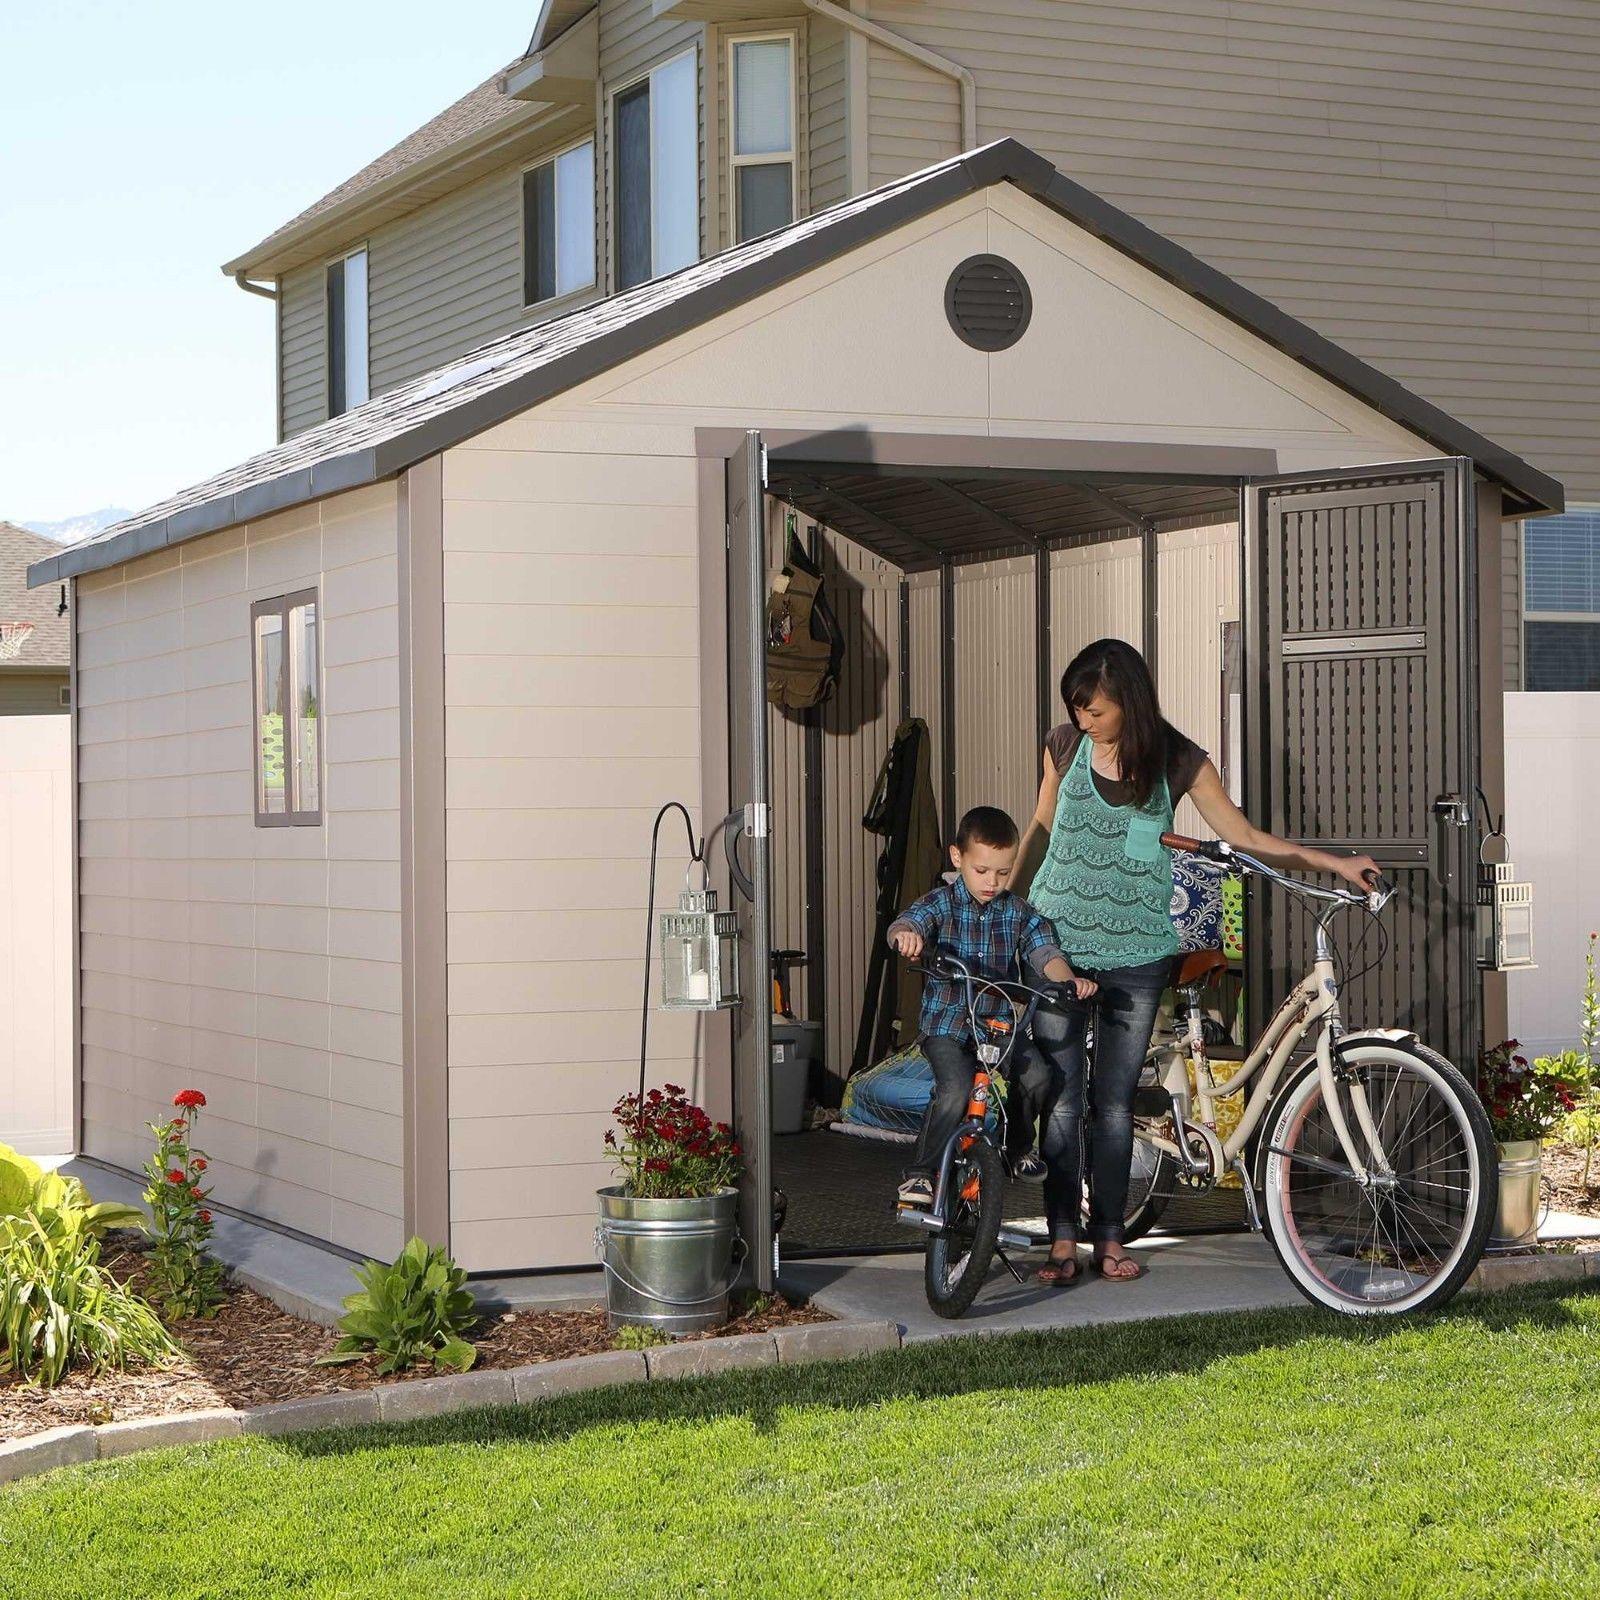 Lifetime 11x16 Plastic Outdoor Storage Shed w/ Floor (6415 / 0125)